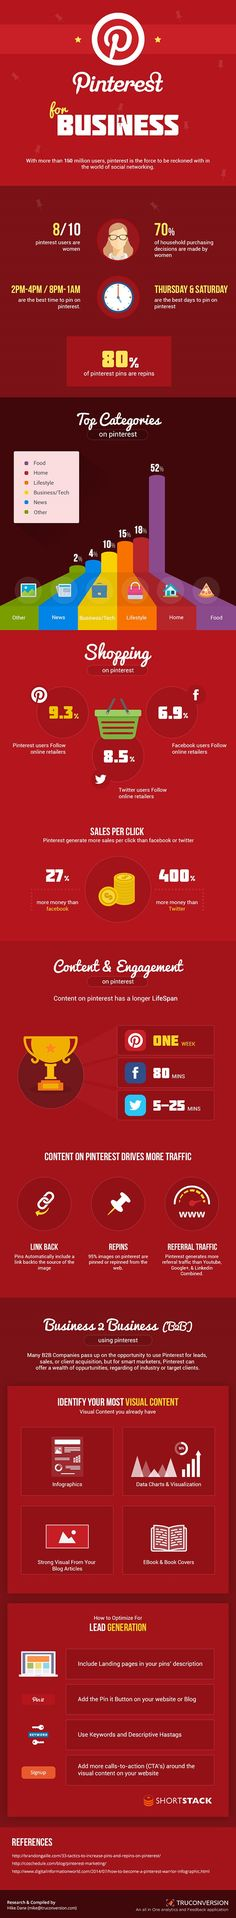 Pinterest infographic gotta love when stuff you love is broken down by the numbers! #pinterest4biz #infographic #socialmedia